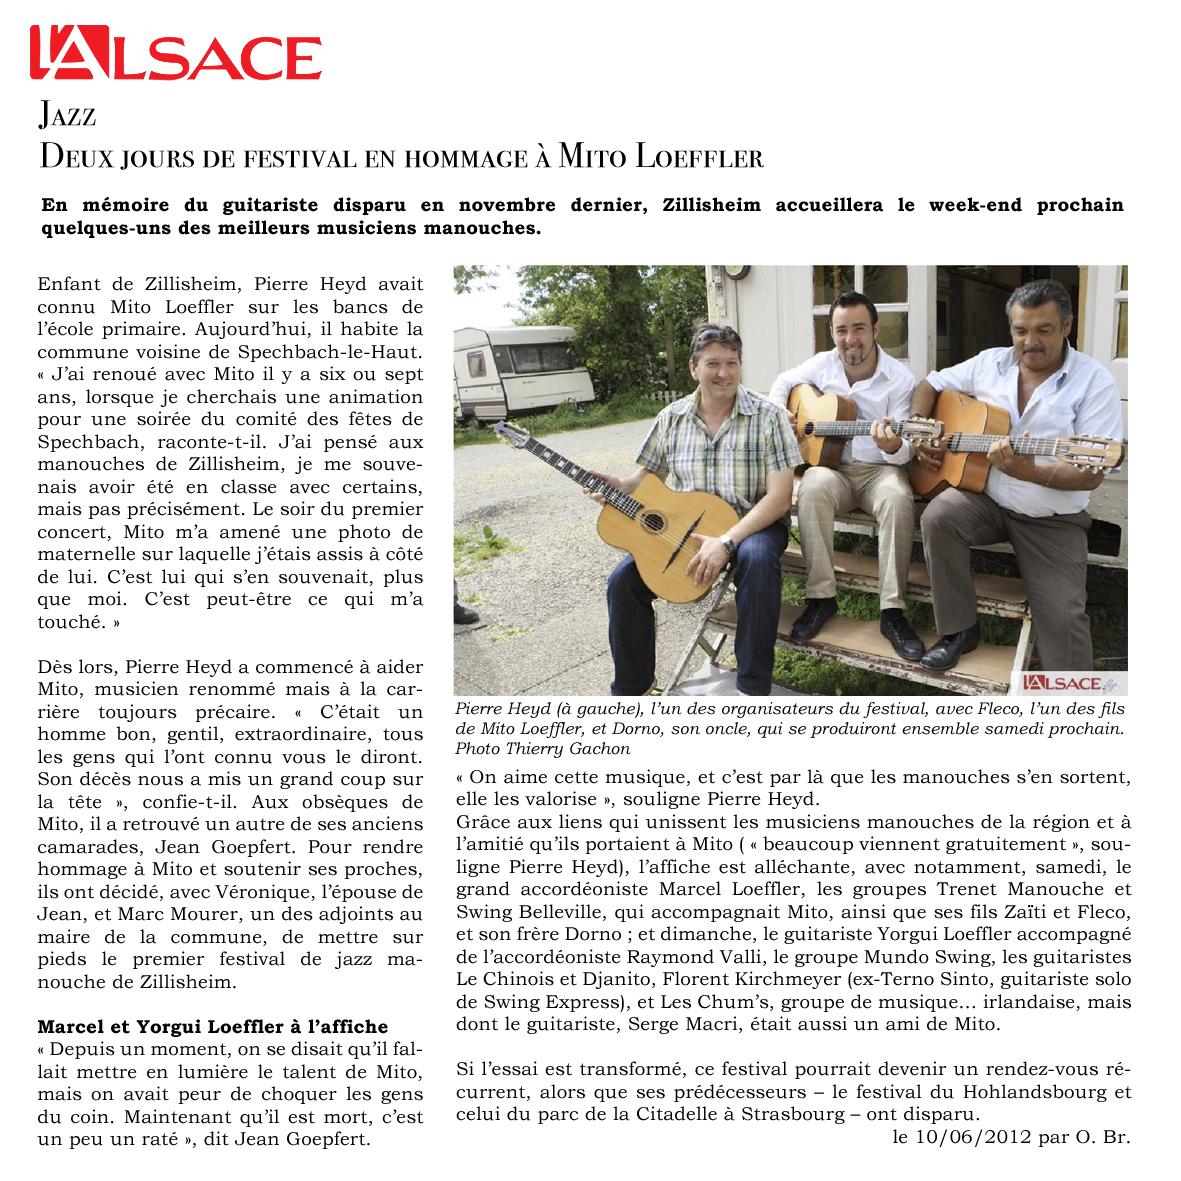 Alsace-10-06-12